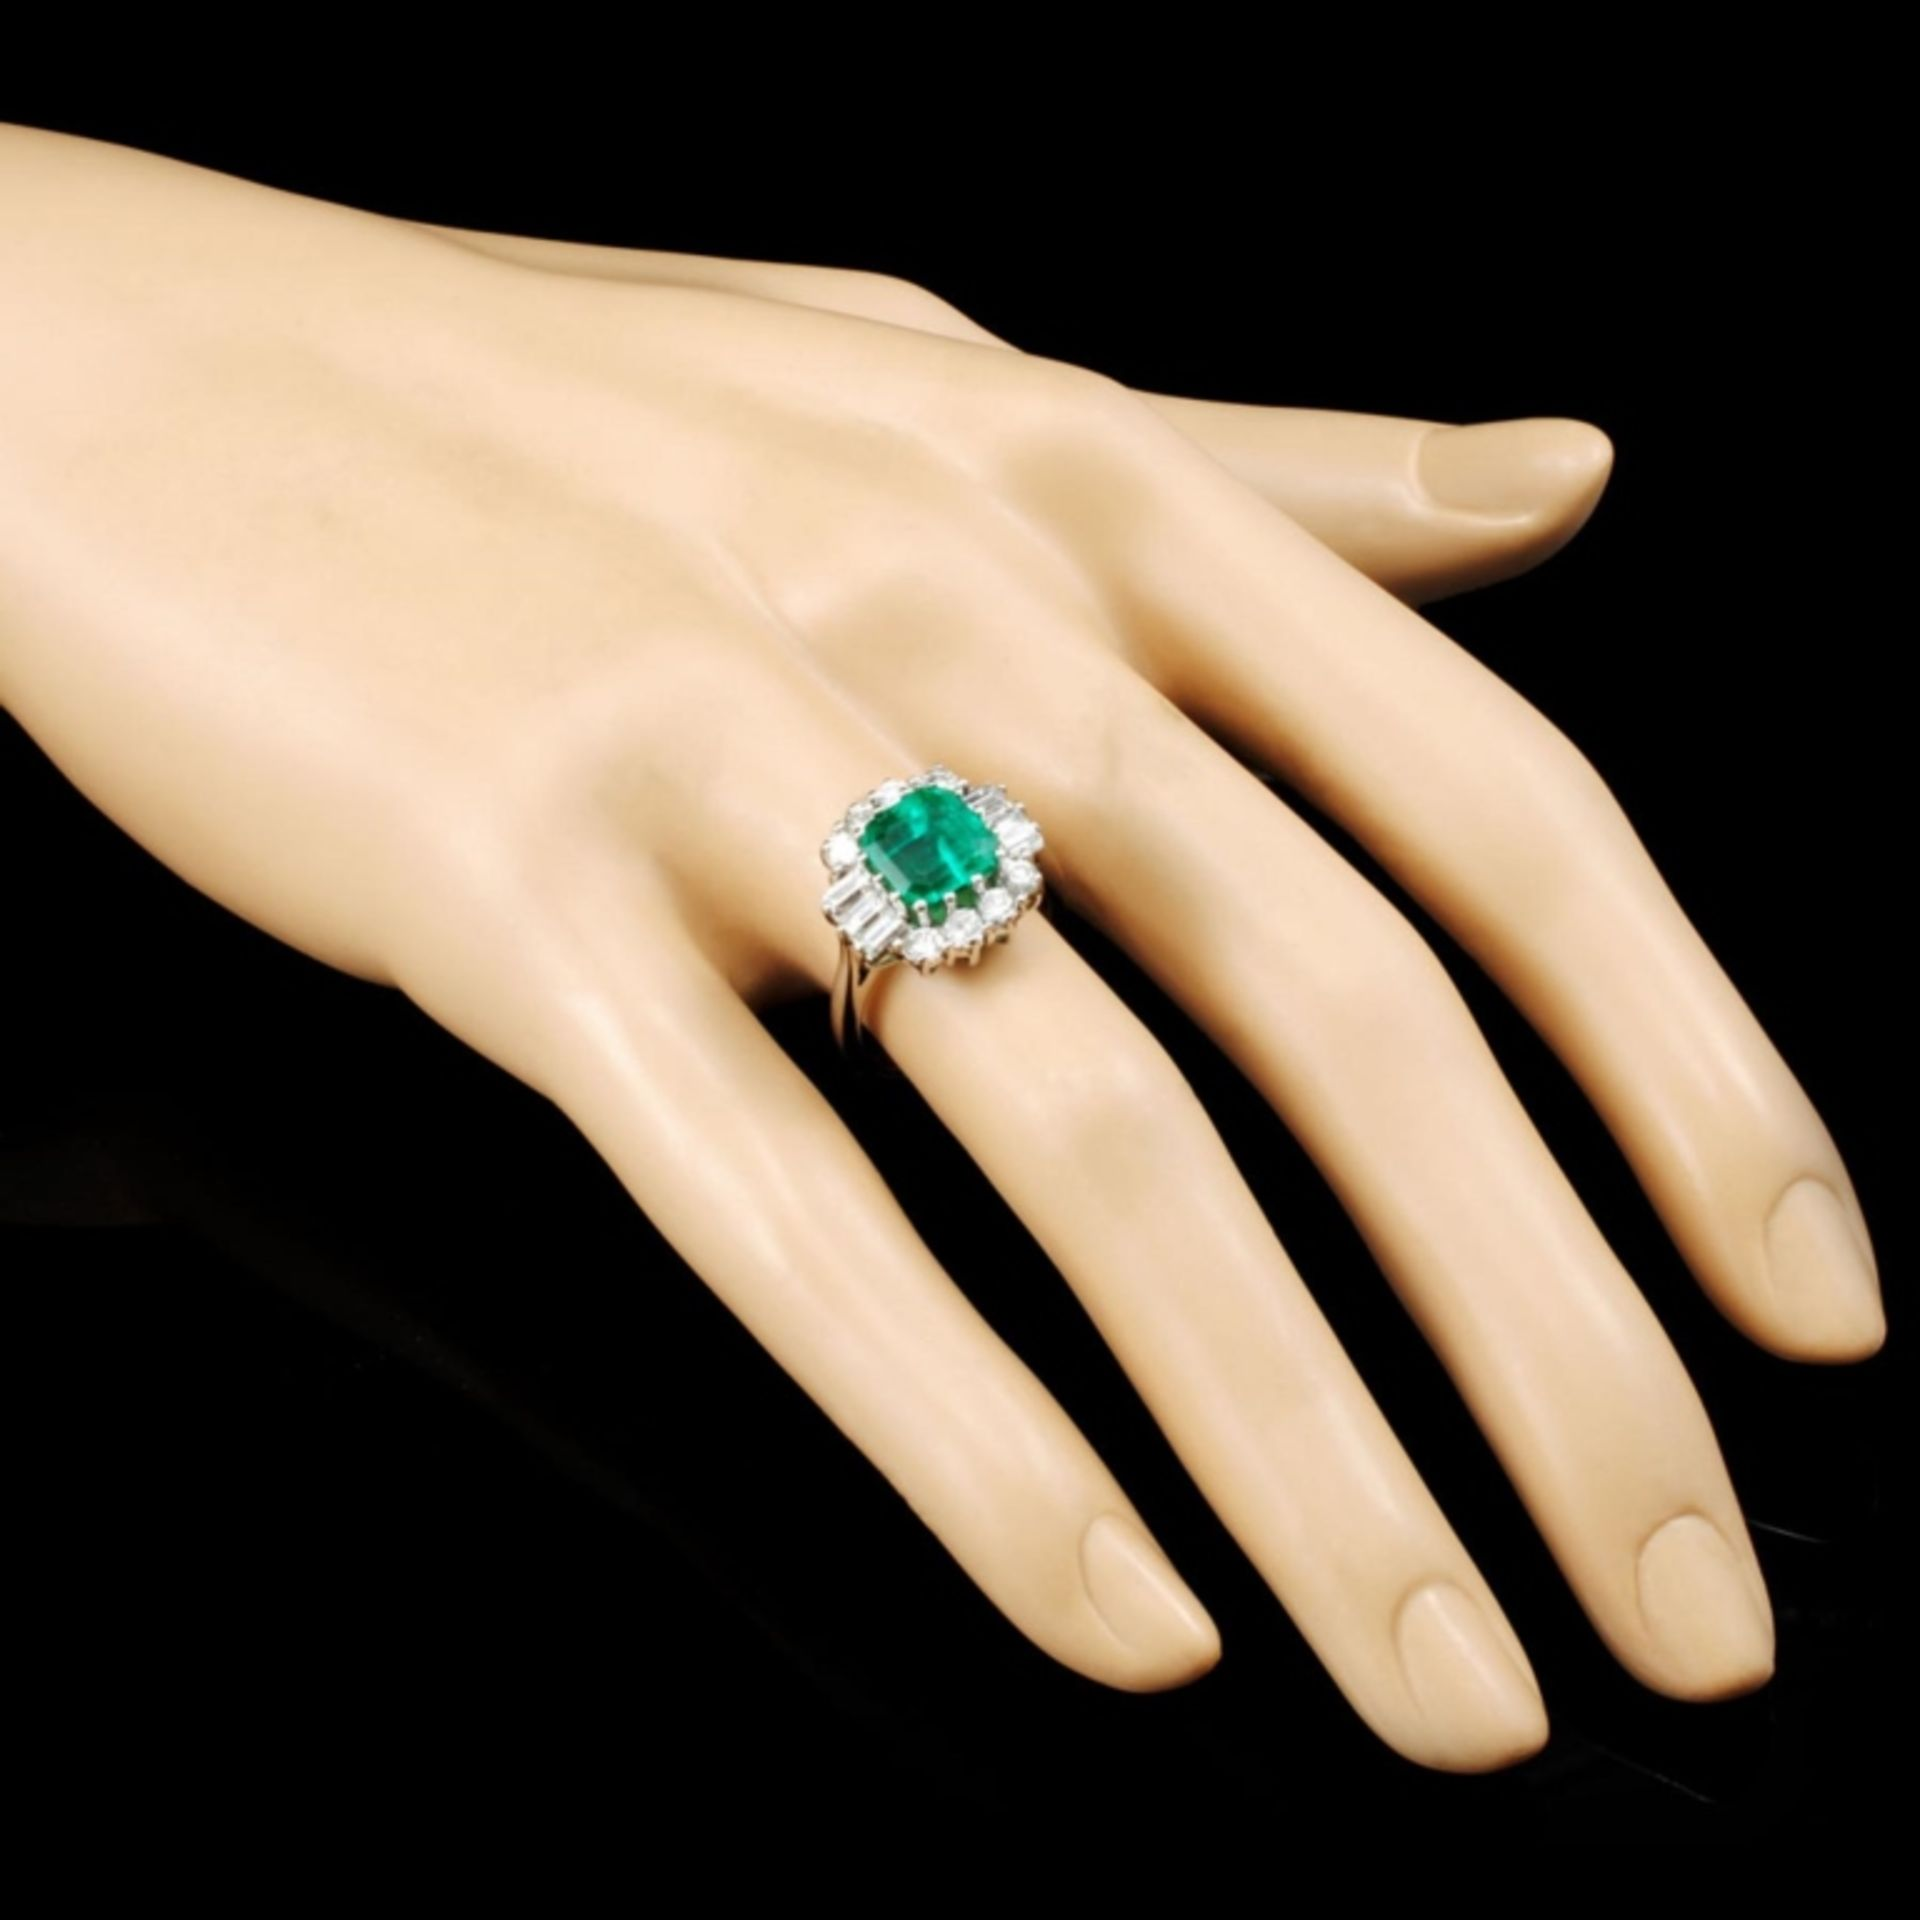 18K Gold 2.80ct Emerald & 1.00ctw Diamond Ring - Image 3 of 5